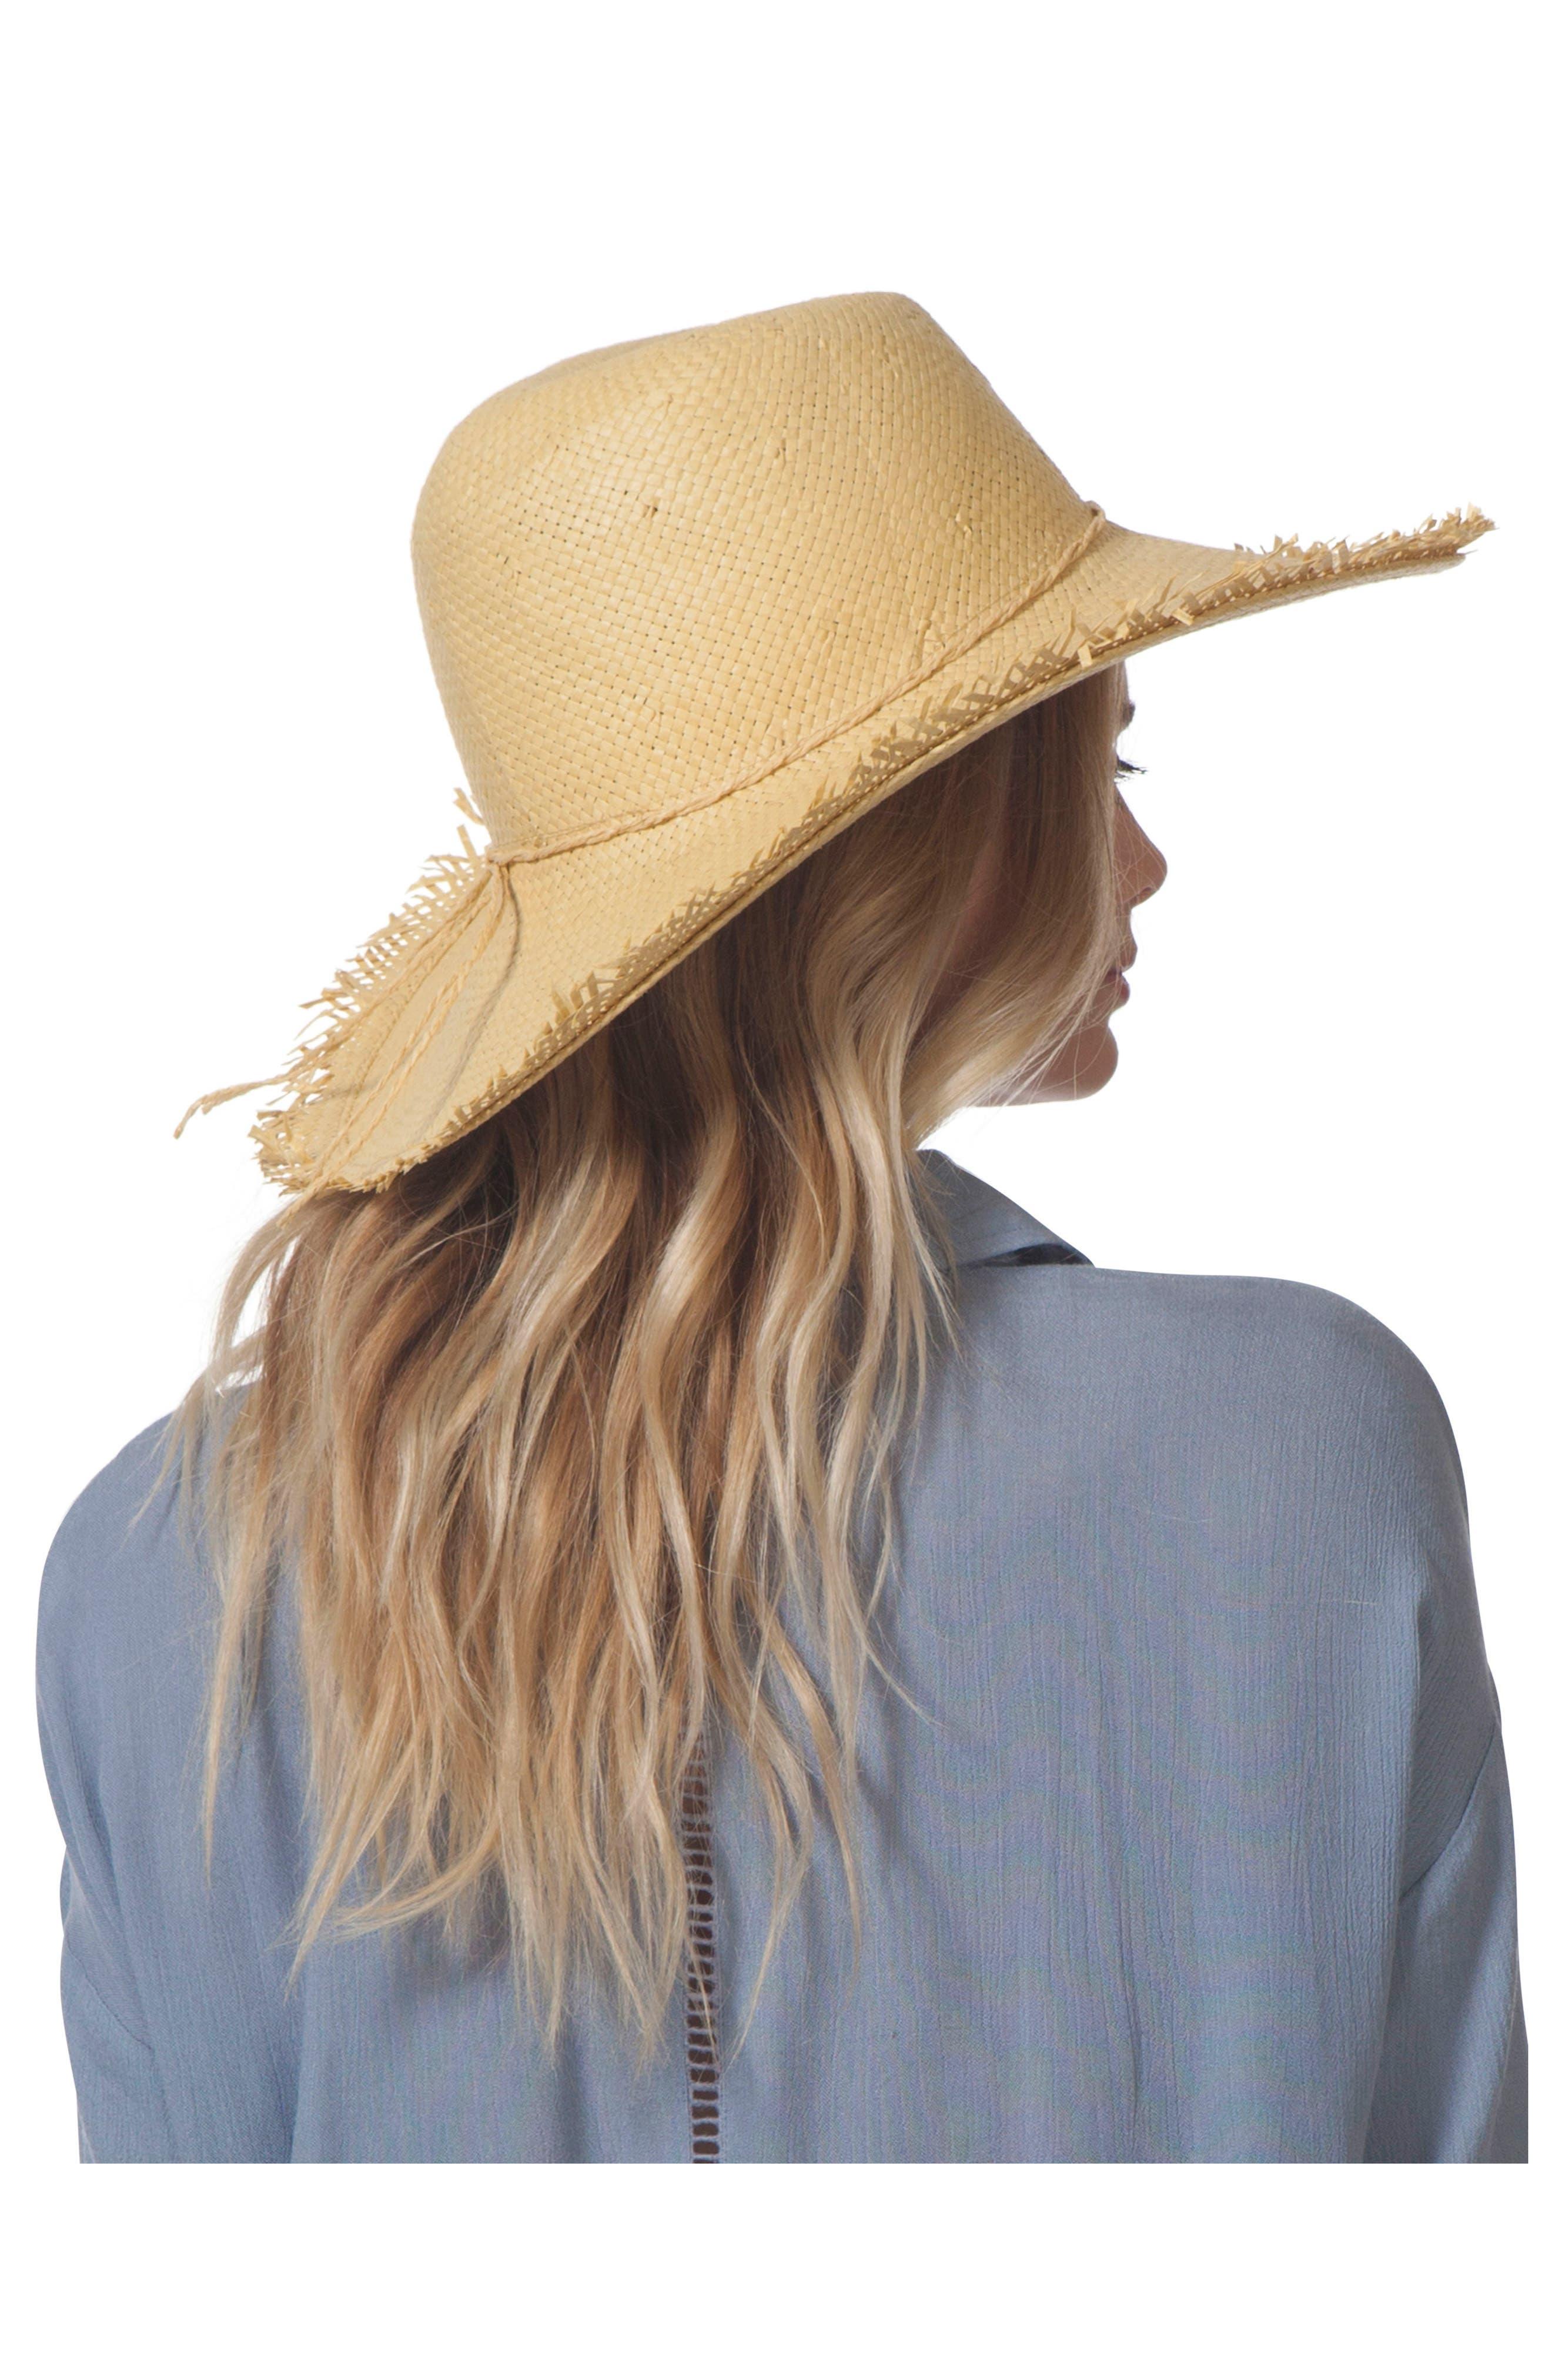 Sandy Boho Straw Hat,                             Alternate thumbnail 2, color,                             250